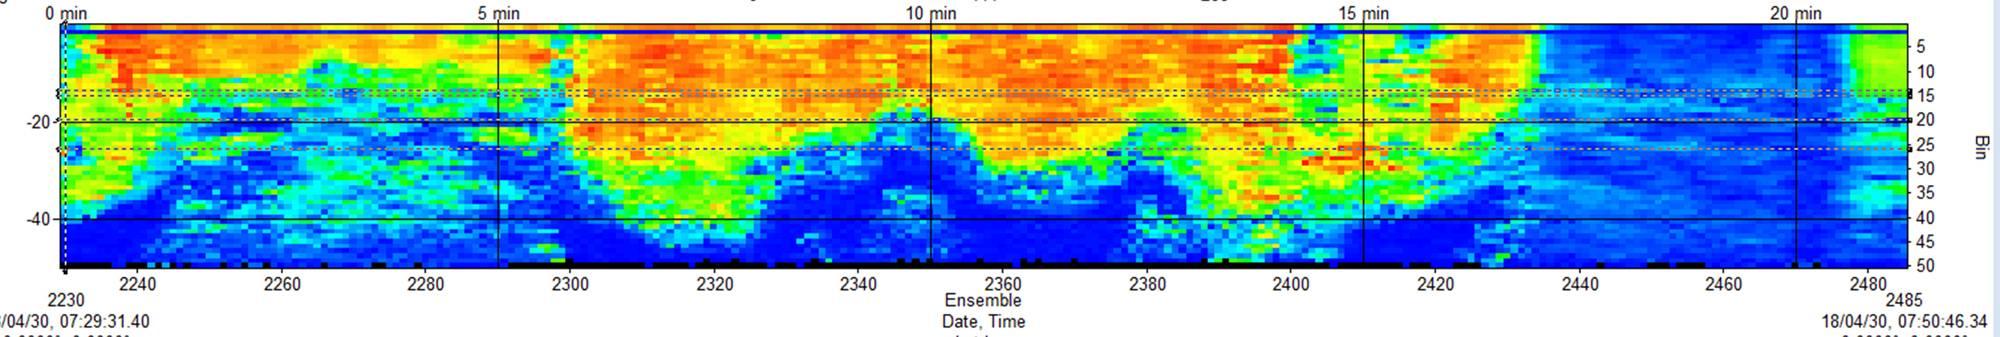 Islay Sound ADCP data. Imagen de MarynSol.